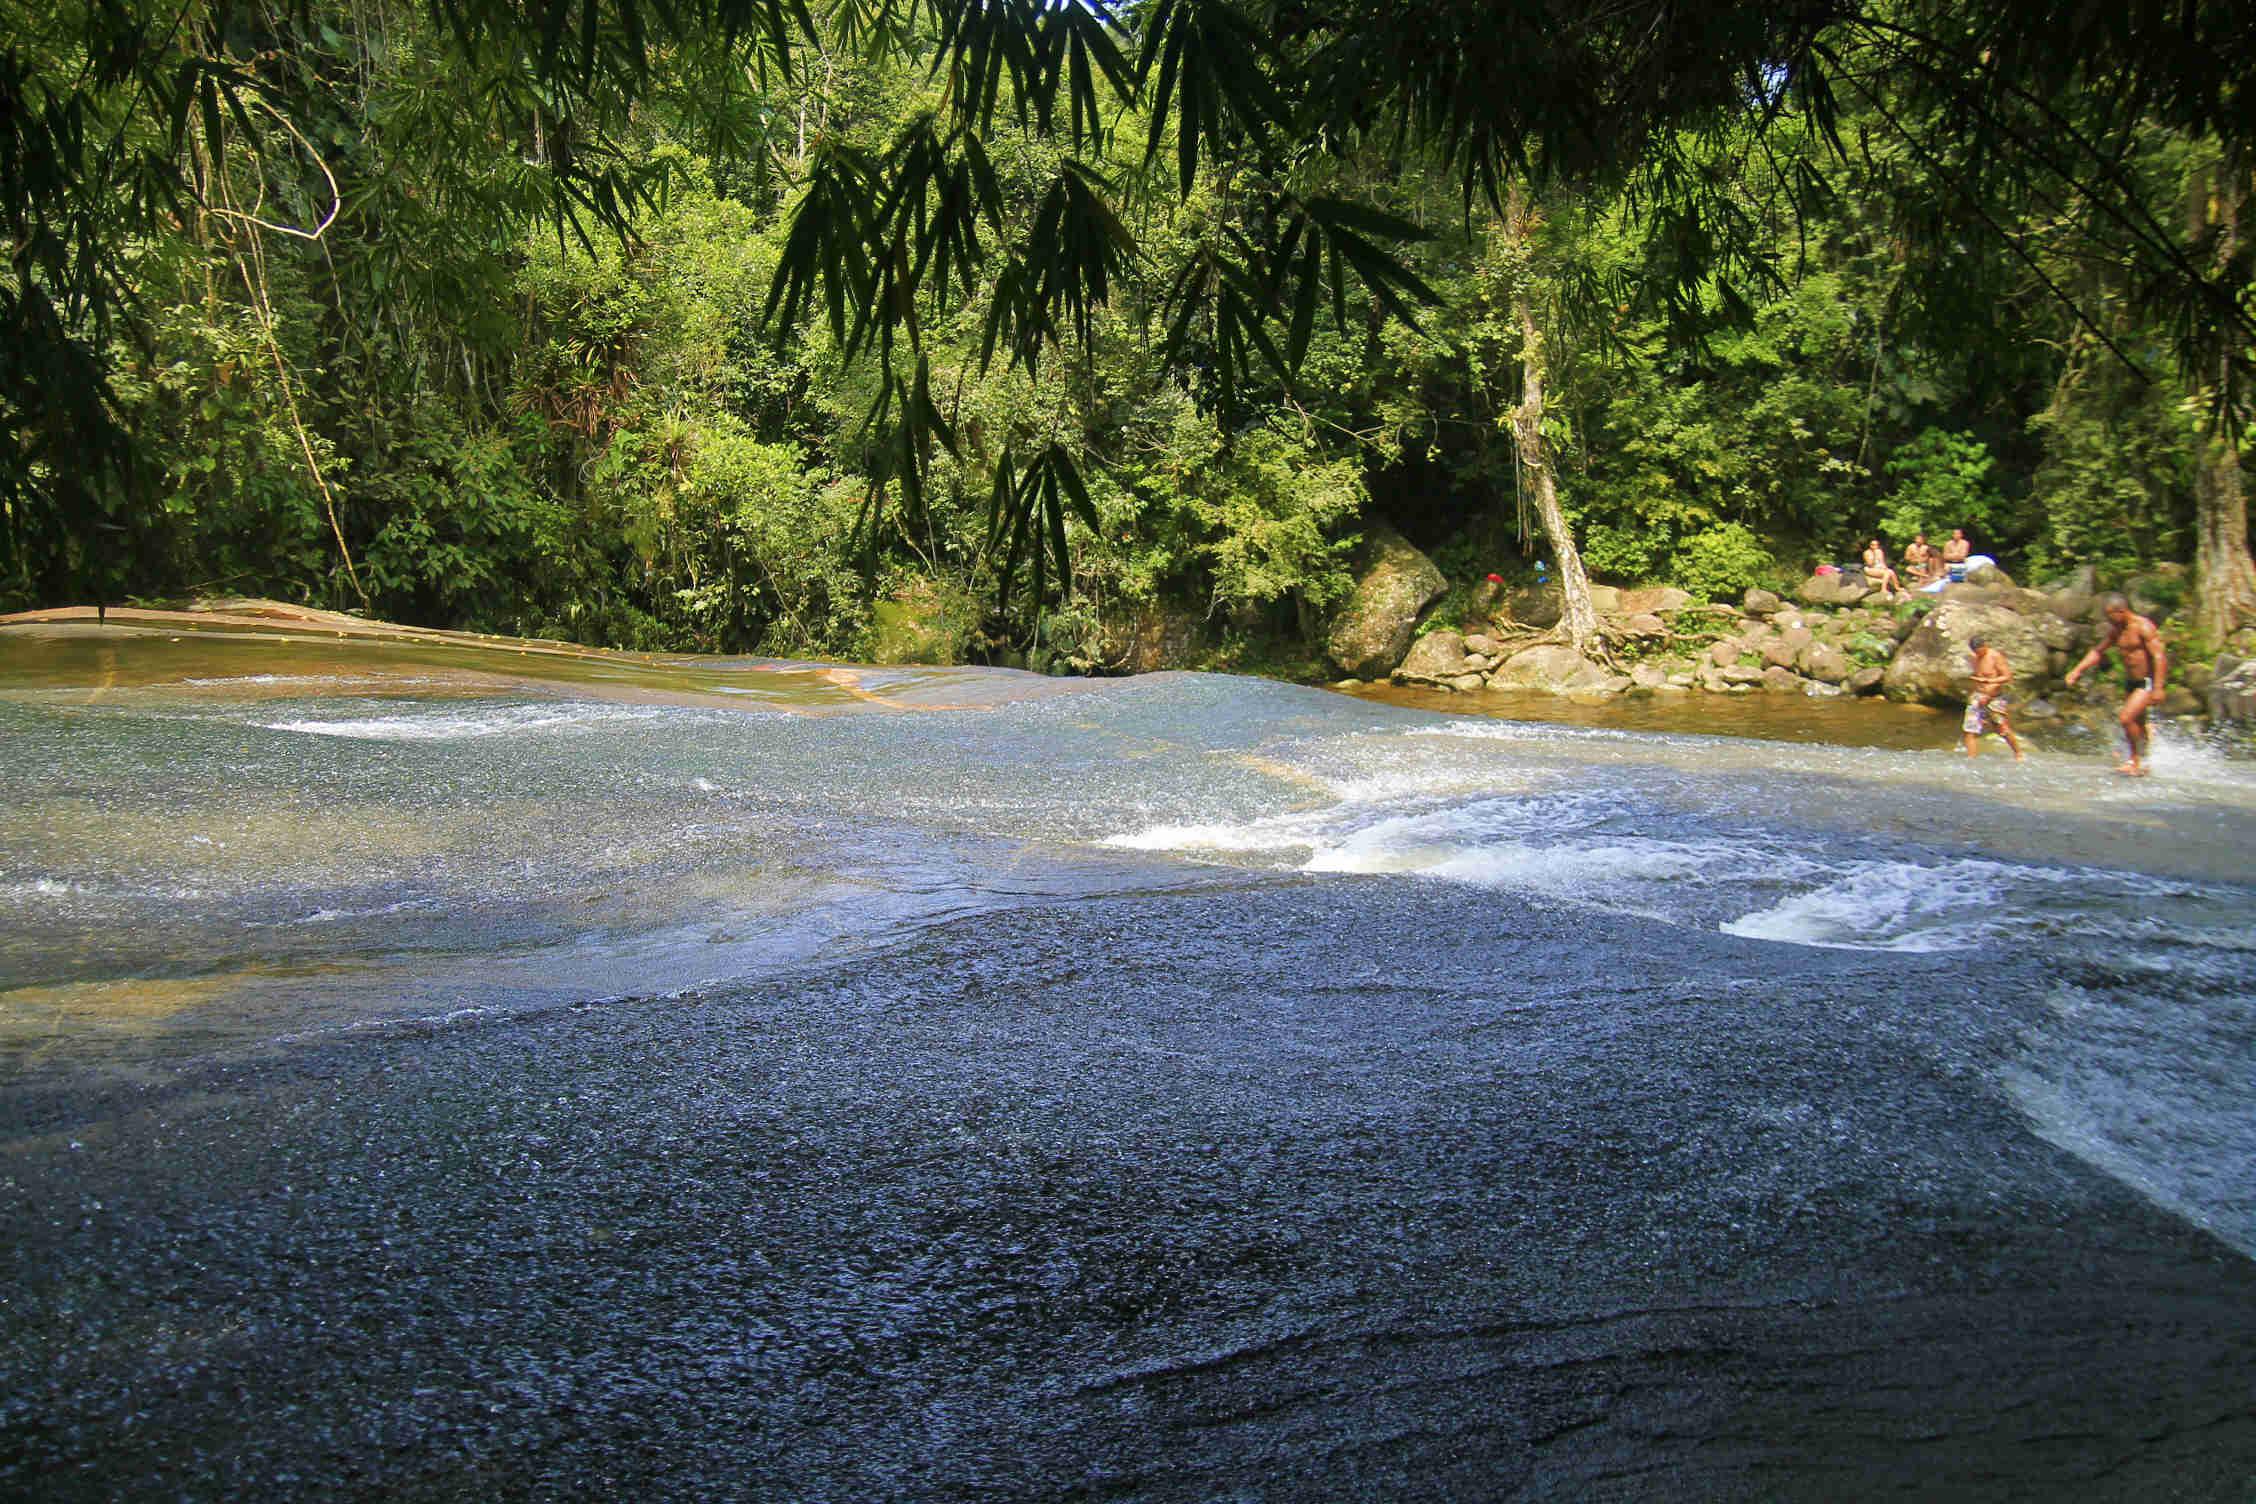 Passeio pelas cachoeiras de Paraty (Foto: Thaís Sabino)